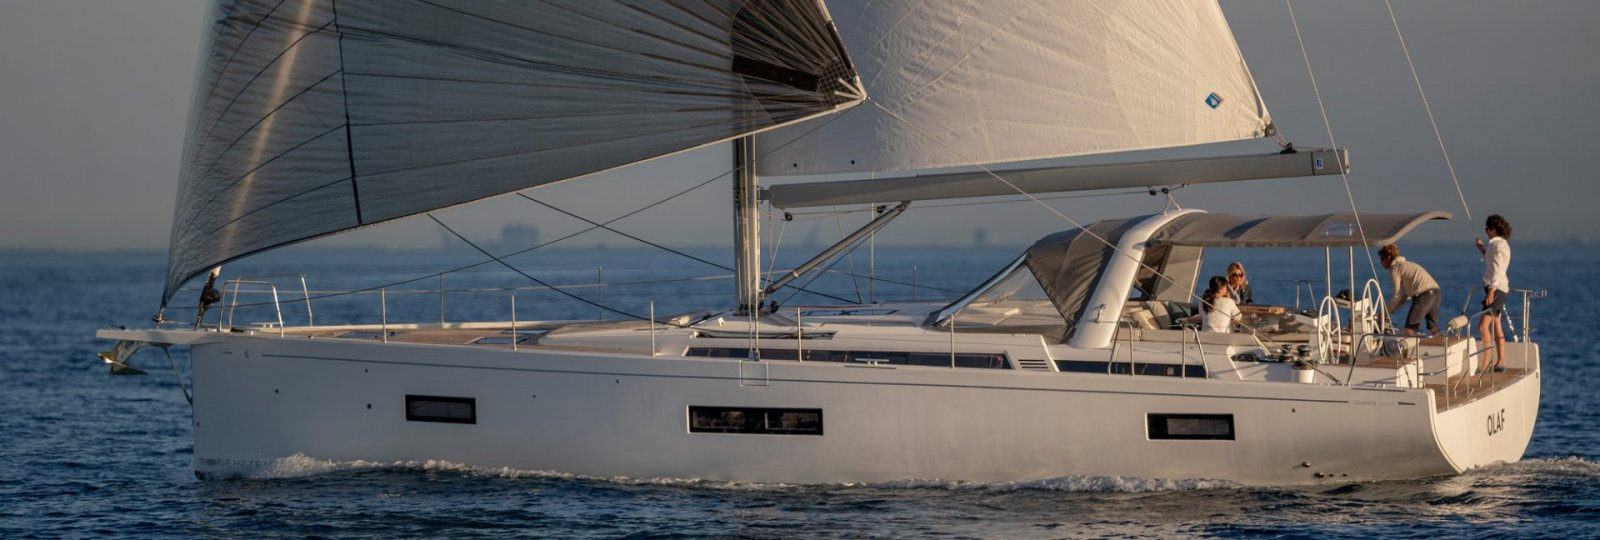 Oceanis Yacht 54 under sail